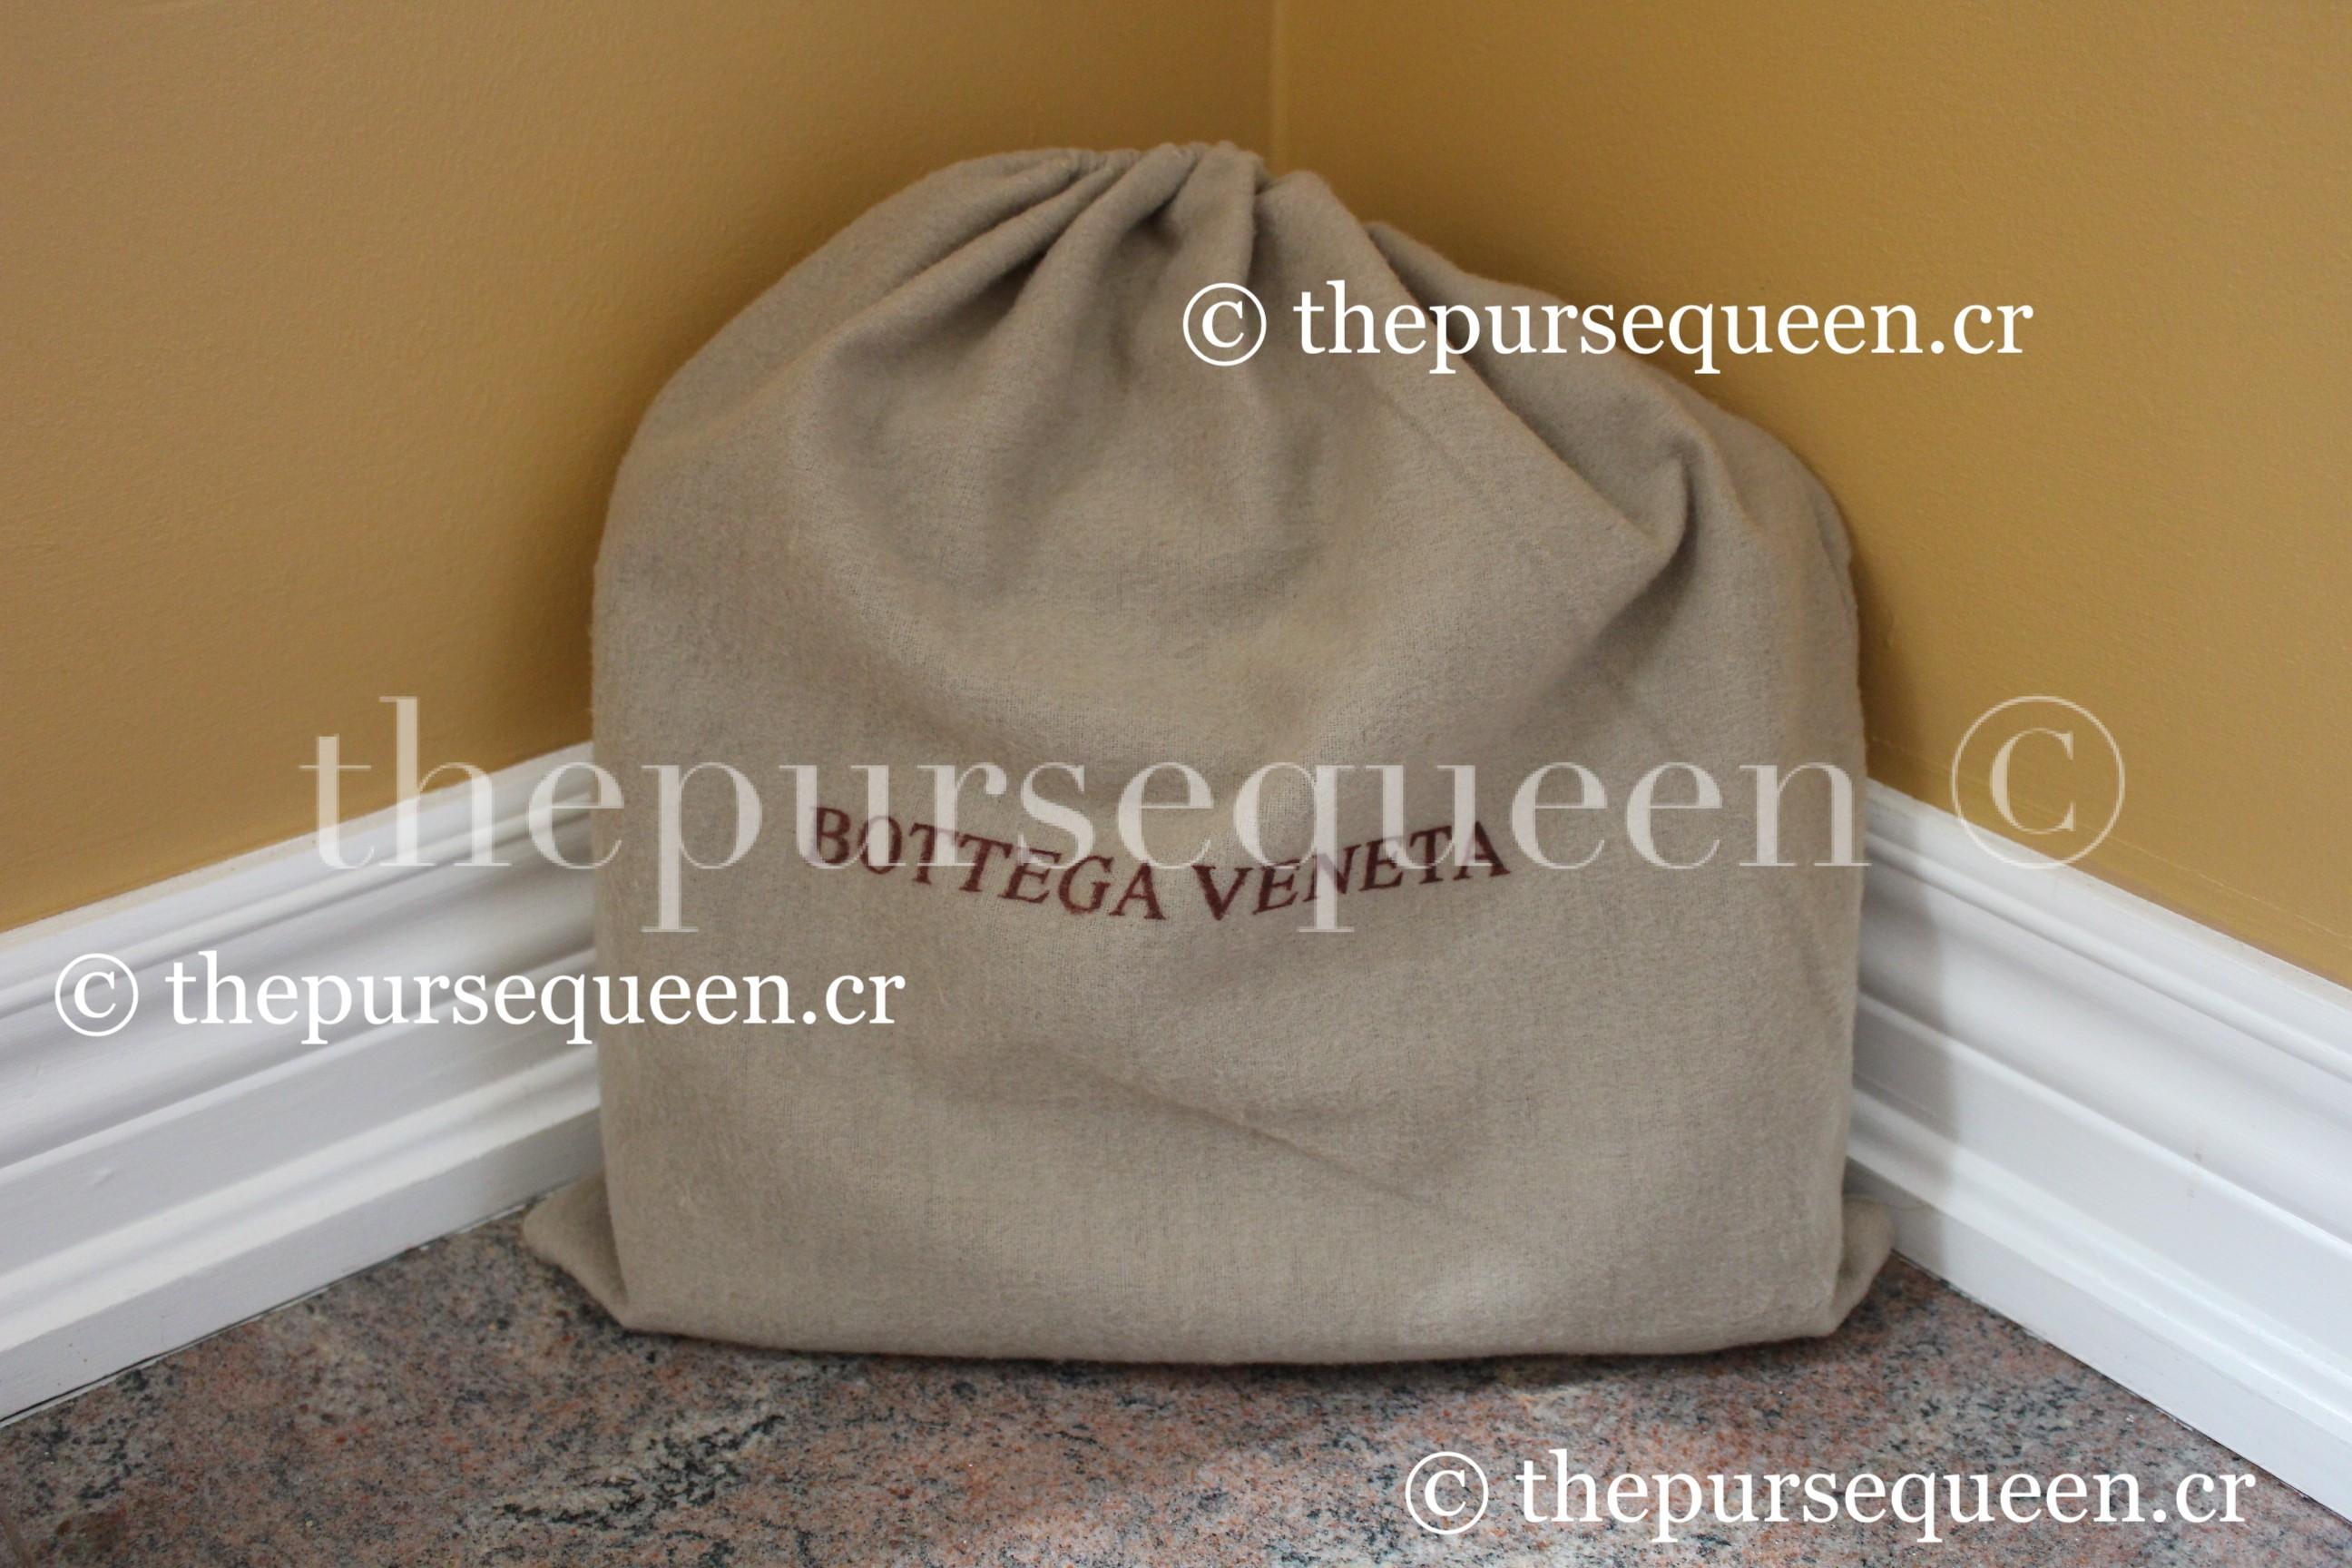 Bottega Veneta Olimpia Bag Replica Review - Authentic   Replica Handbag  Reviews by The Purse Queen c15b21c8d014e